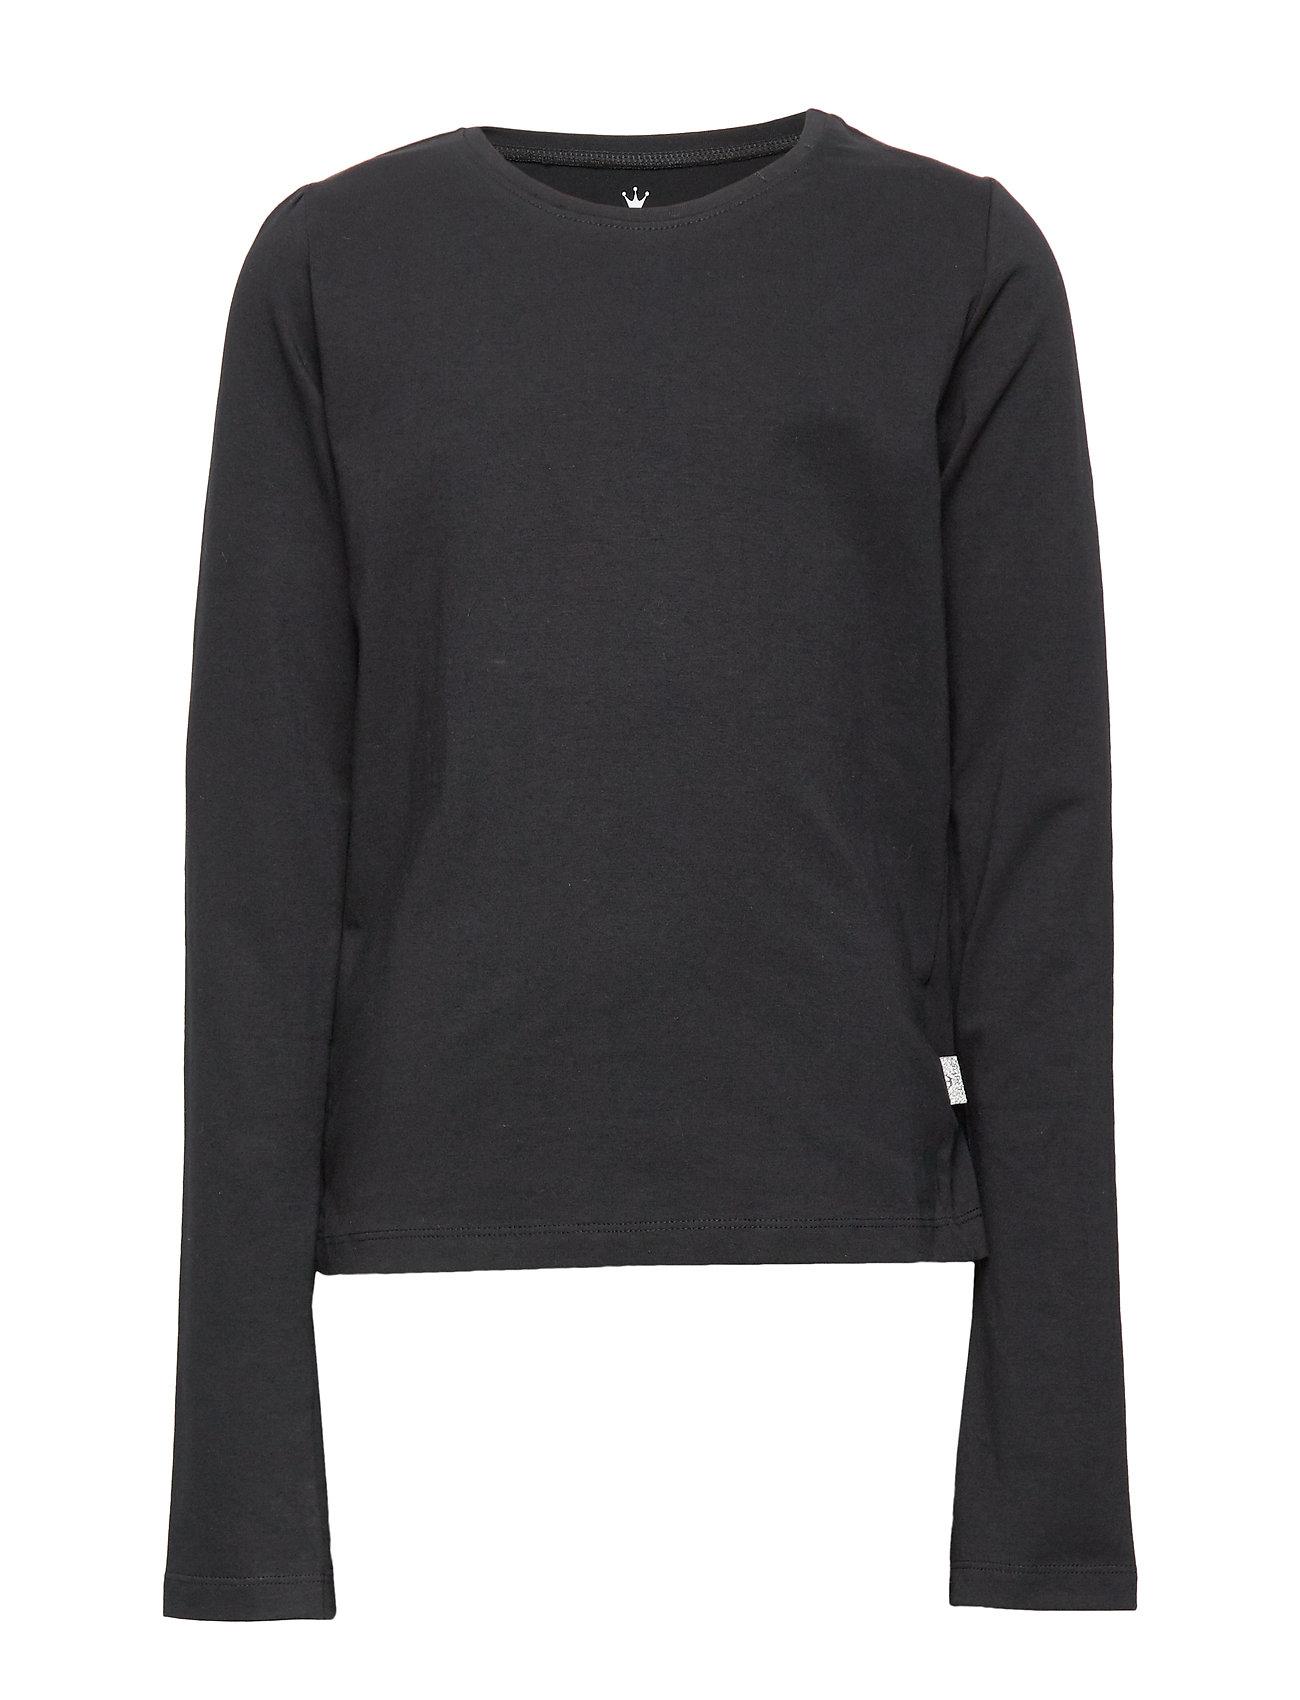 Hust & Claire T-shirt - BLACK